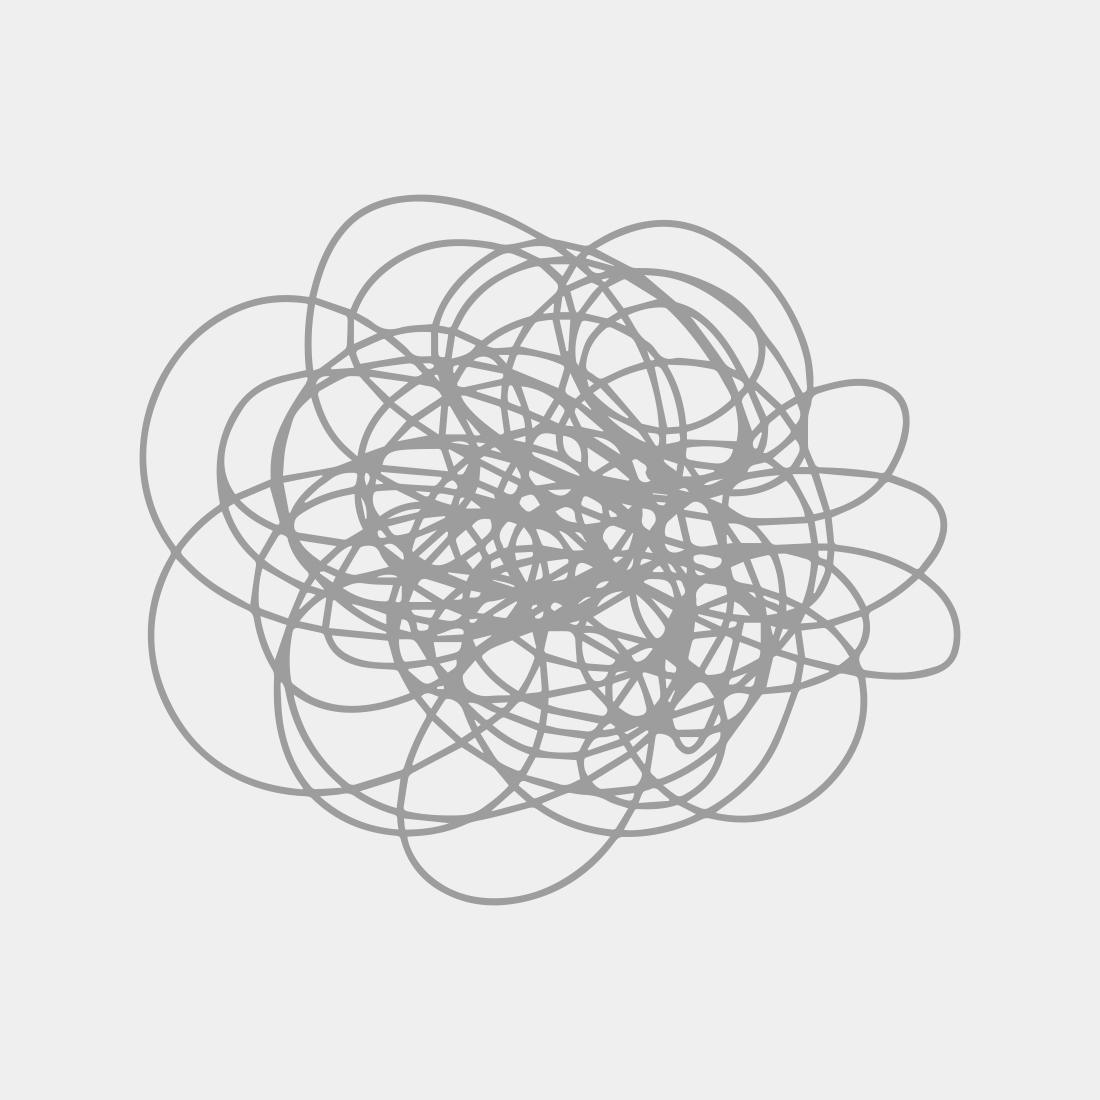 Albert Irvin OBE RA Untitled opus w.13 (framed)